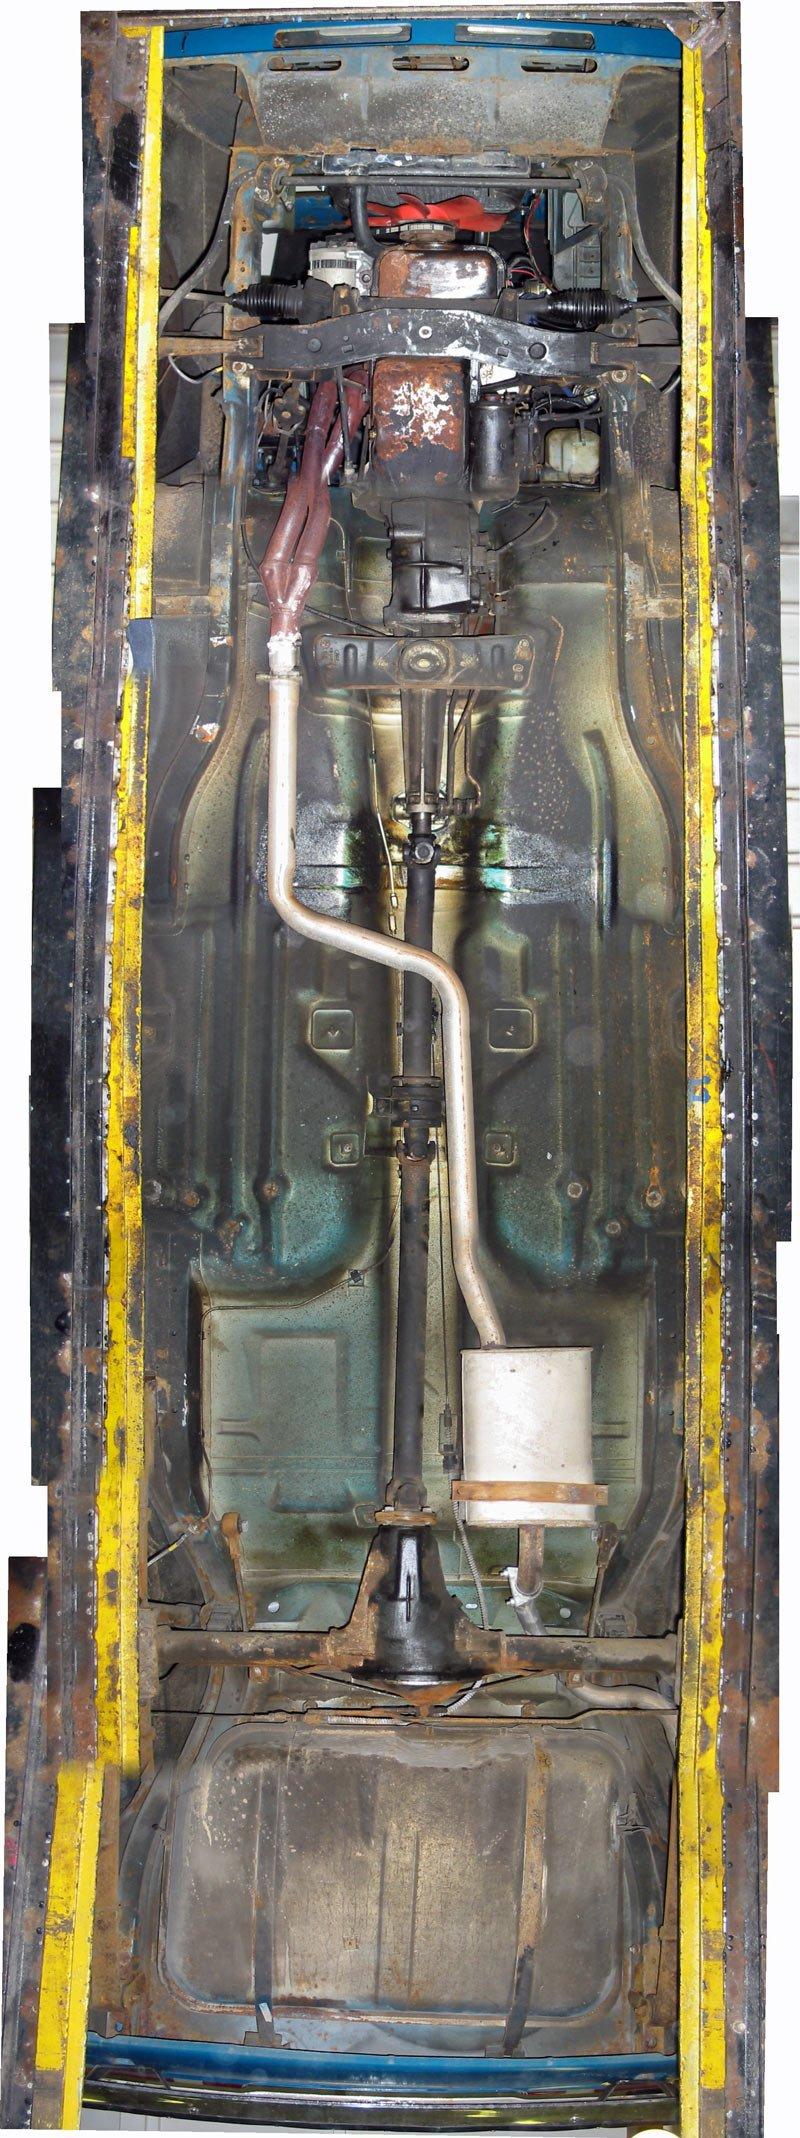 Capri underside, engine, drivetrain, propshaft, exhaust and fuel tank composite